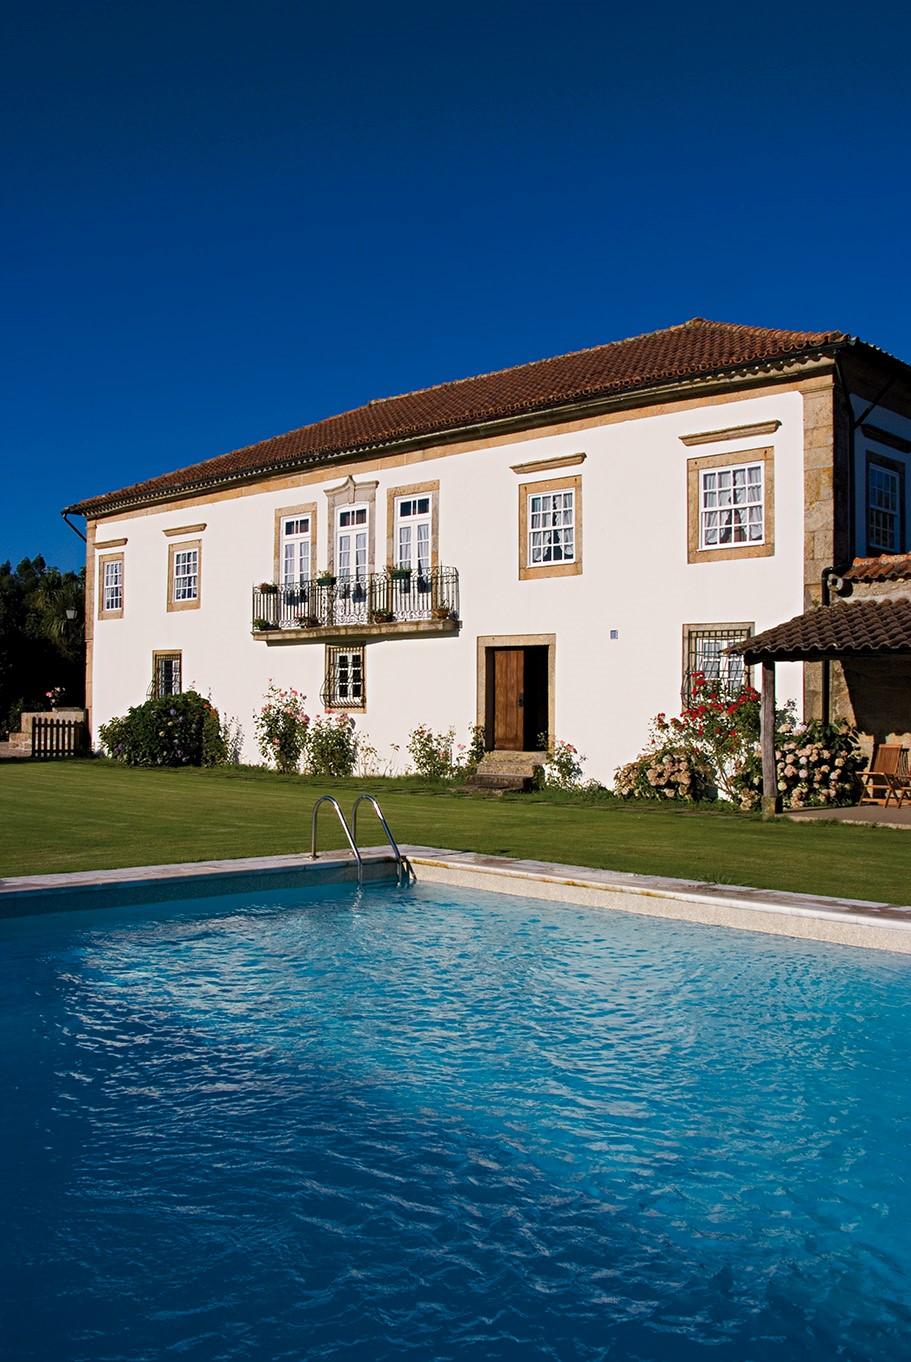 maisons au portugal interesting maisons au portugal with maisons au portugal gallery of. Black Bedroom Furniture Sets. Home Design Ideas